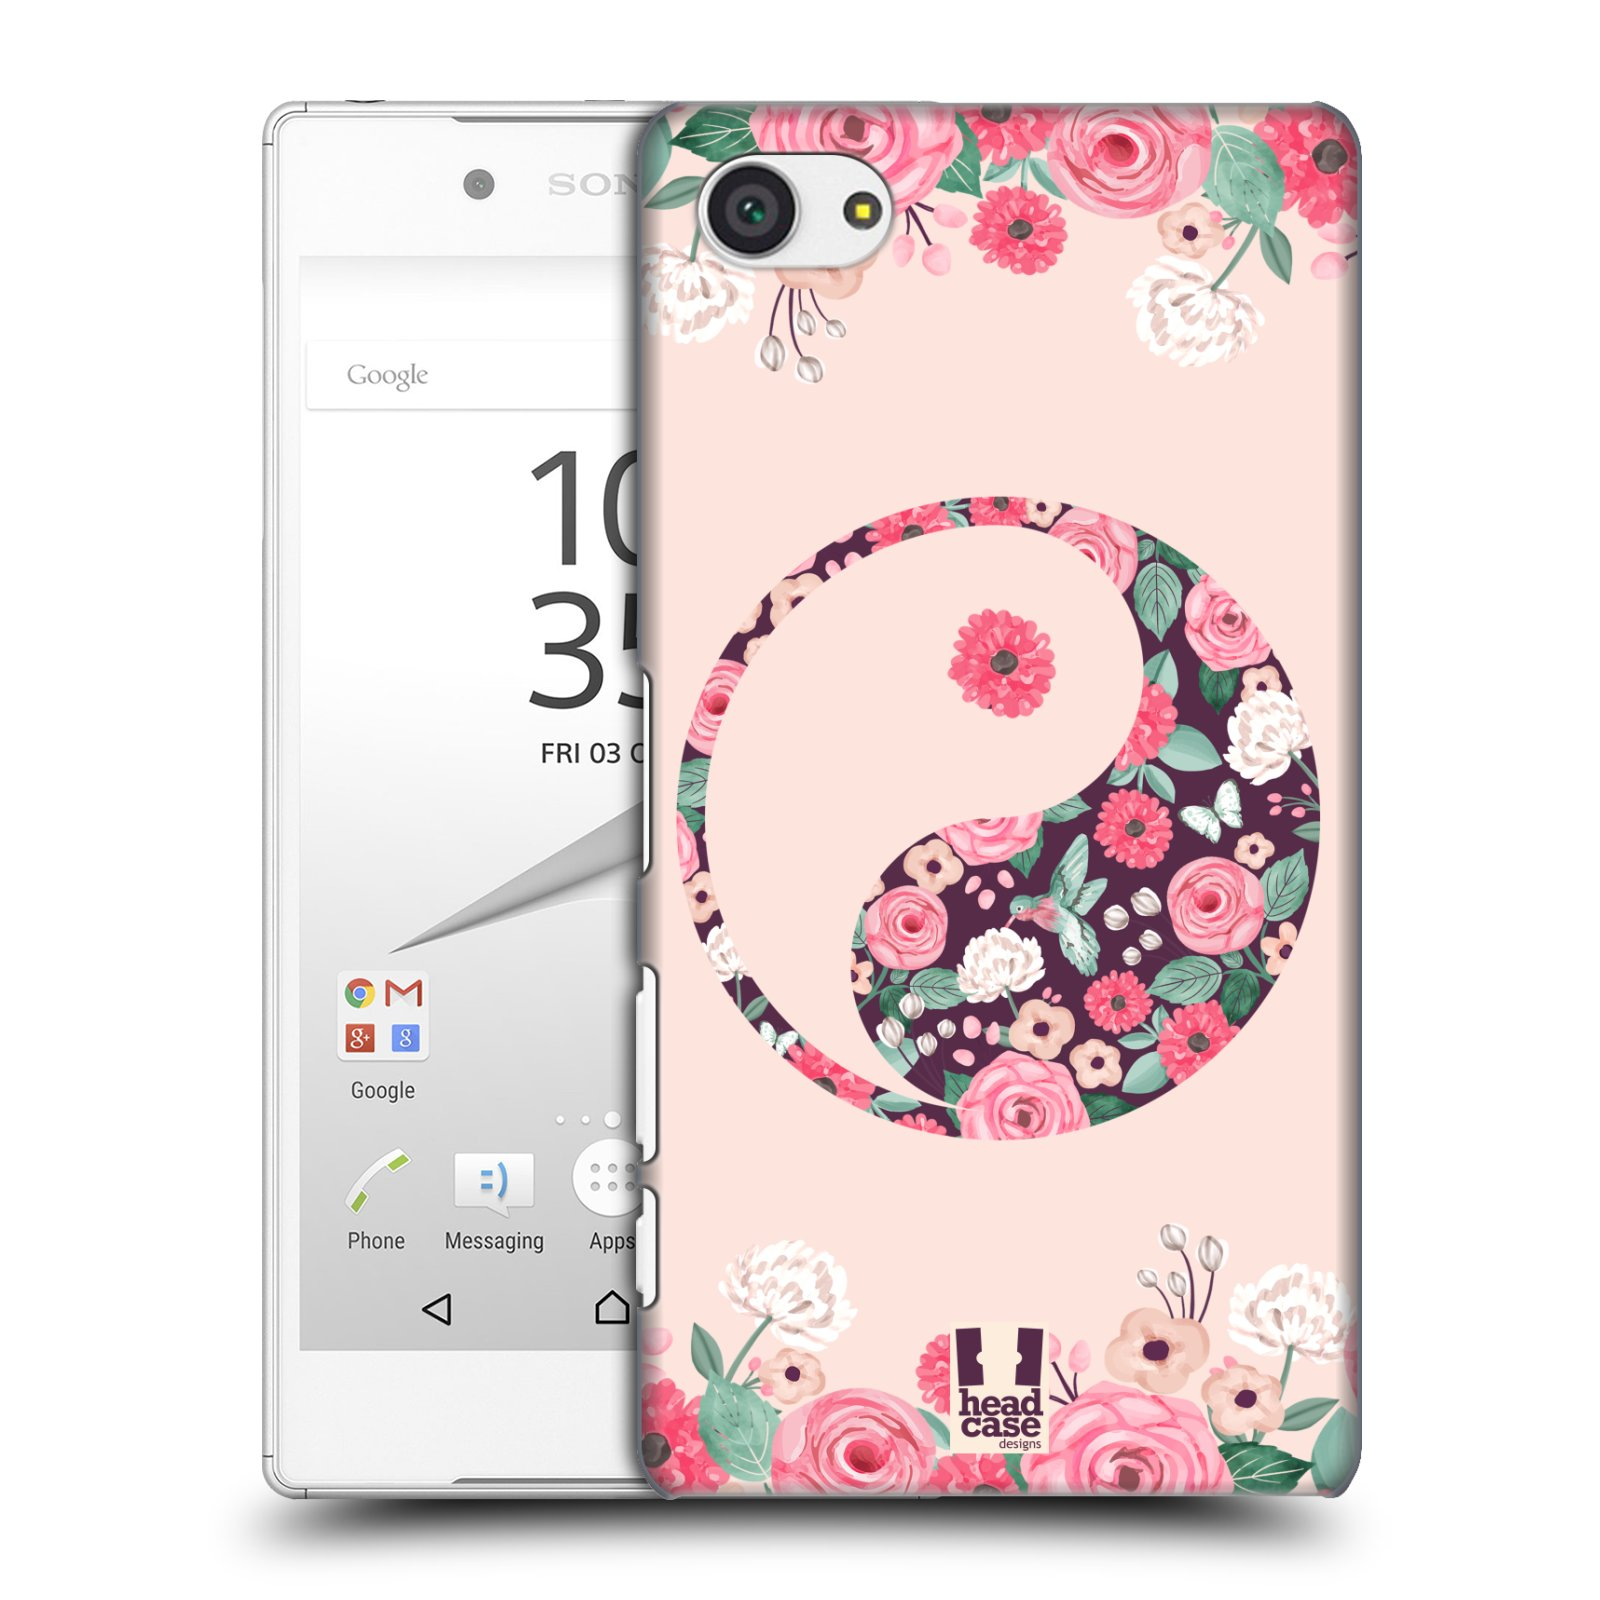 Plastové pouzdro na mobil Sony Xperia Z5 Compact HEAD CASE Yin a Yang Floral